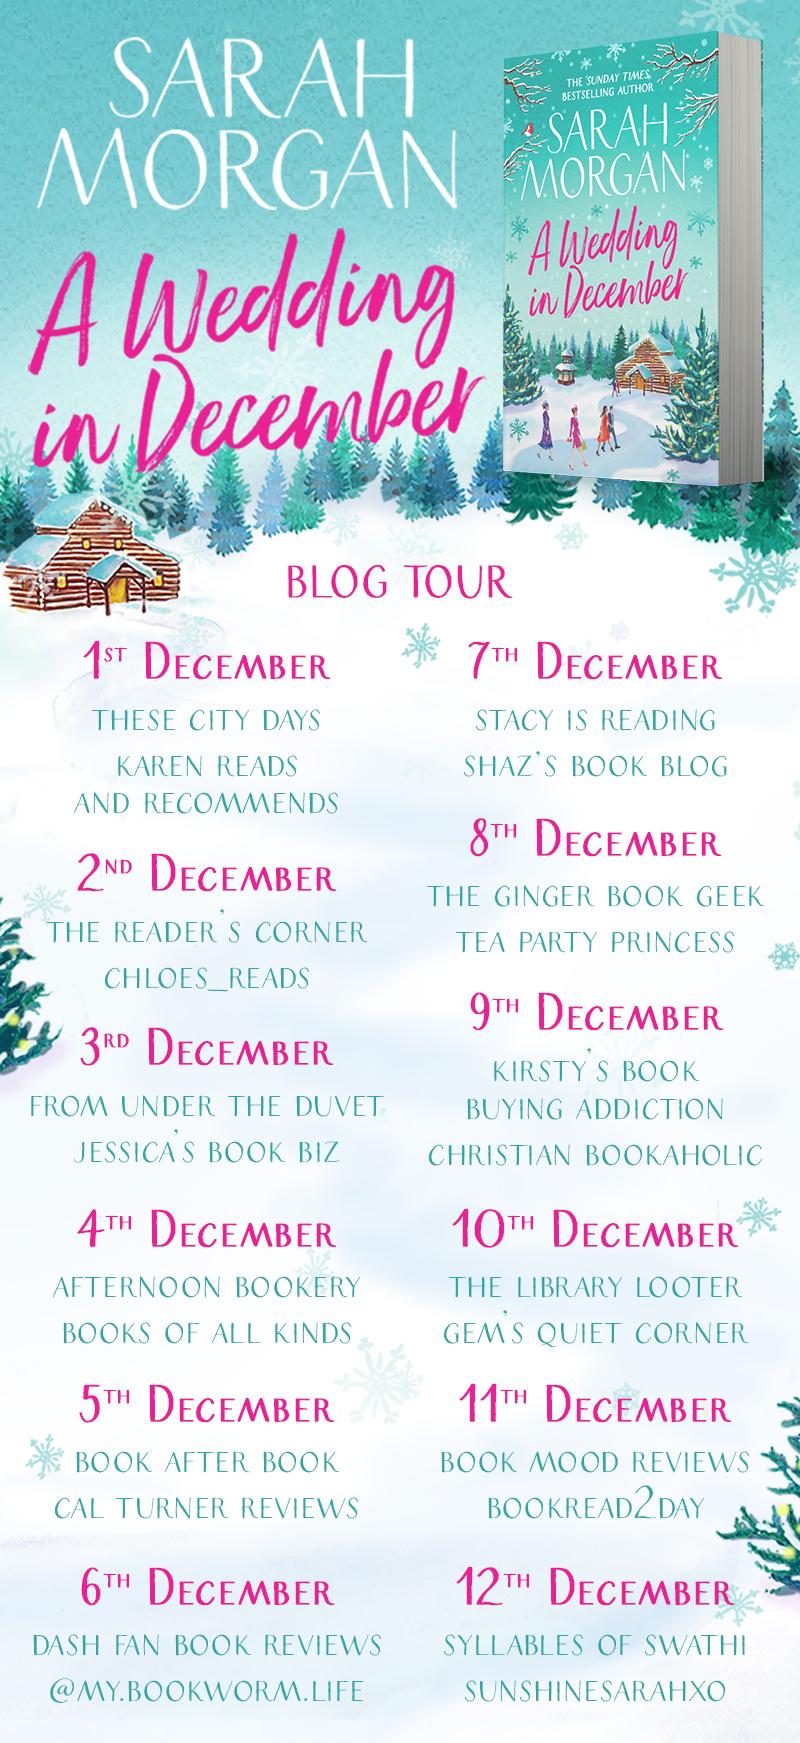 A Wedding in December Blog Tour Banner